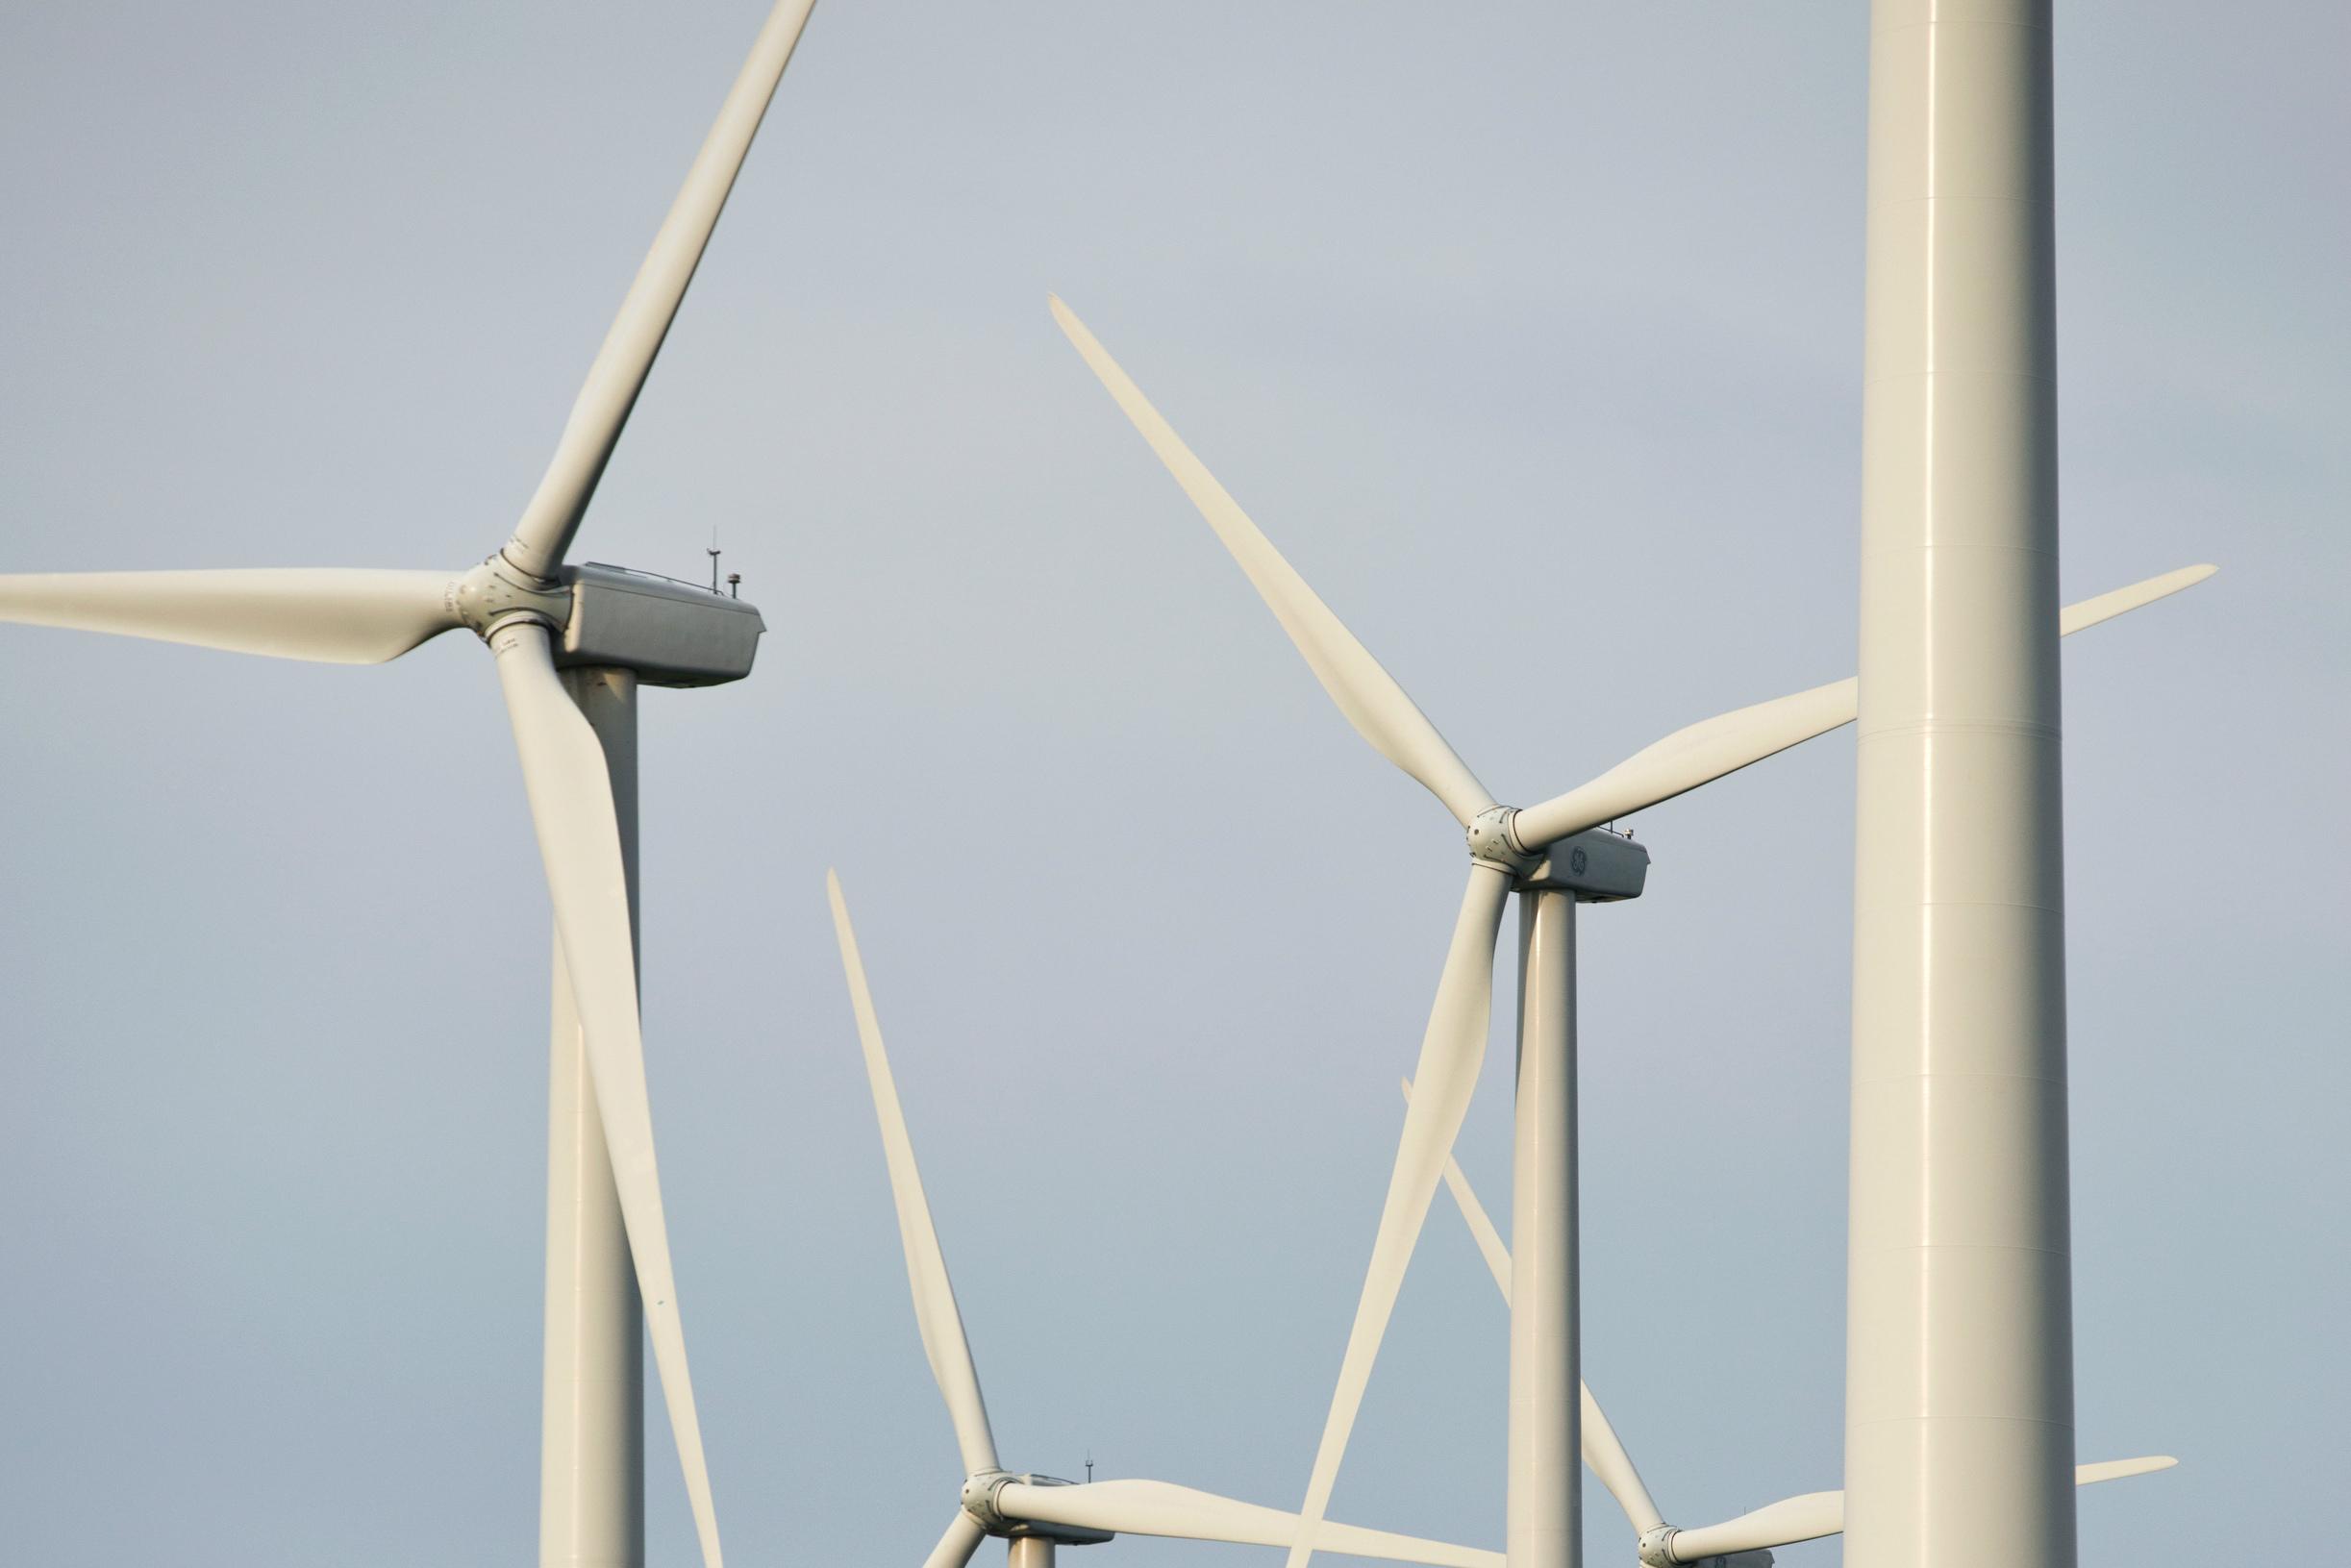 Northern Sweden winds will power Google